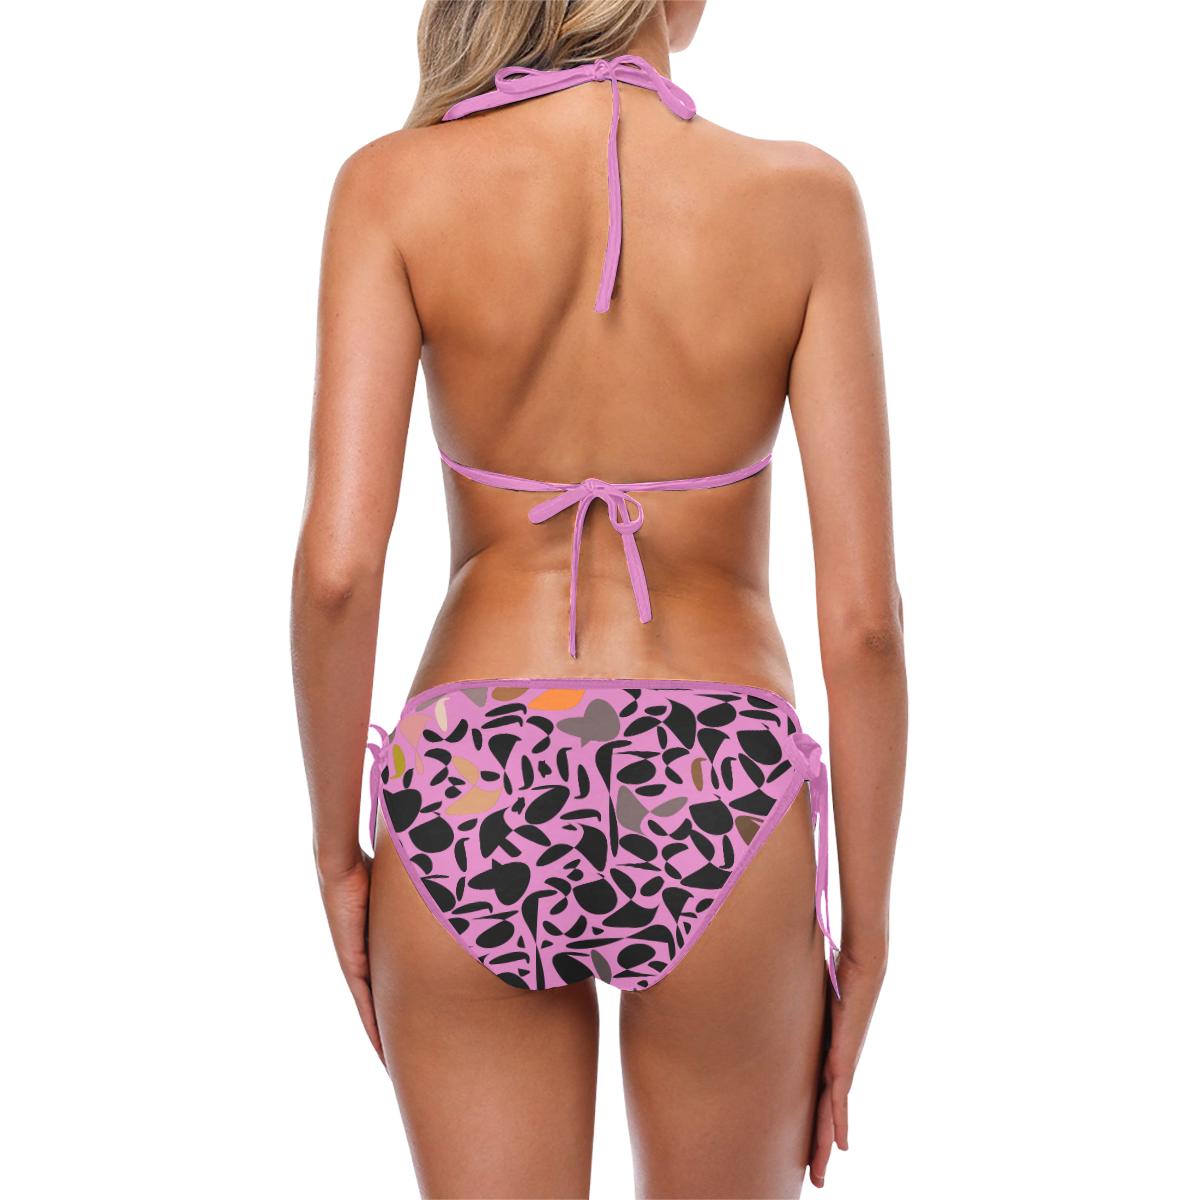 zappwaits u1 Custom Bikini Swimsuit (Model S01)